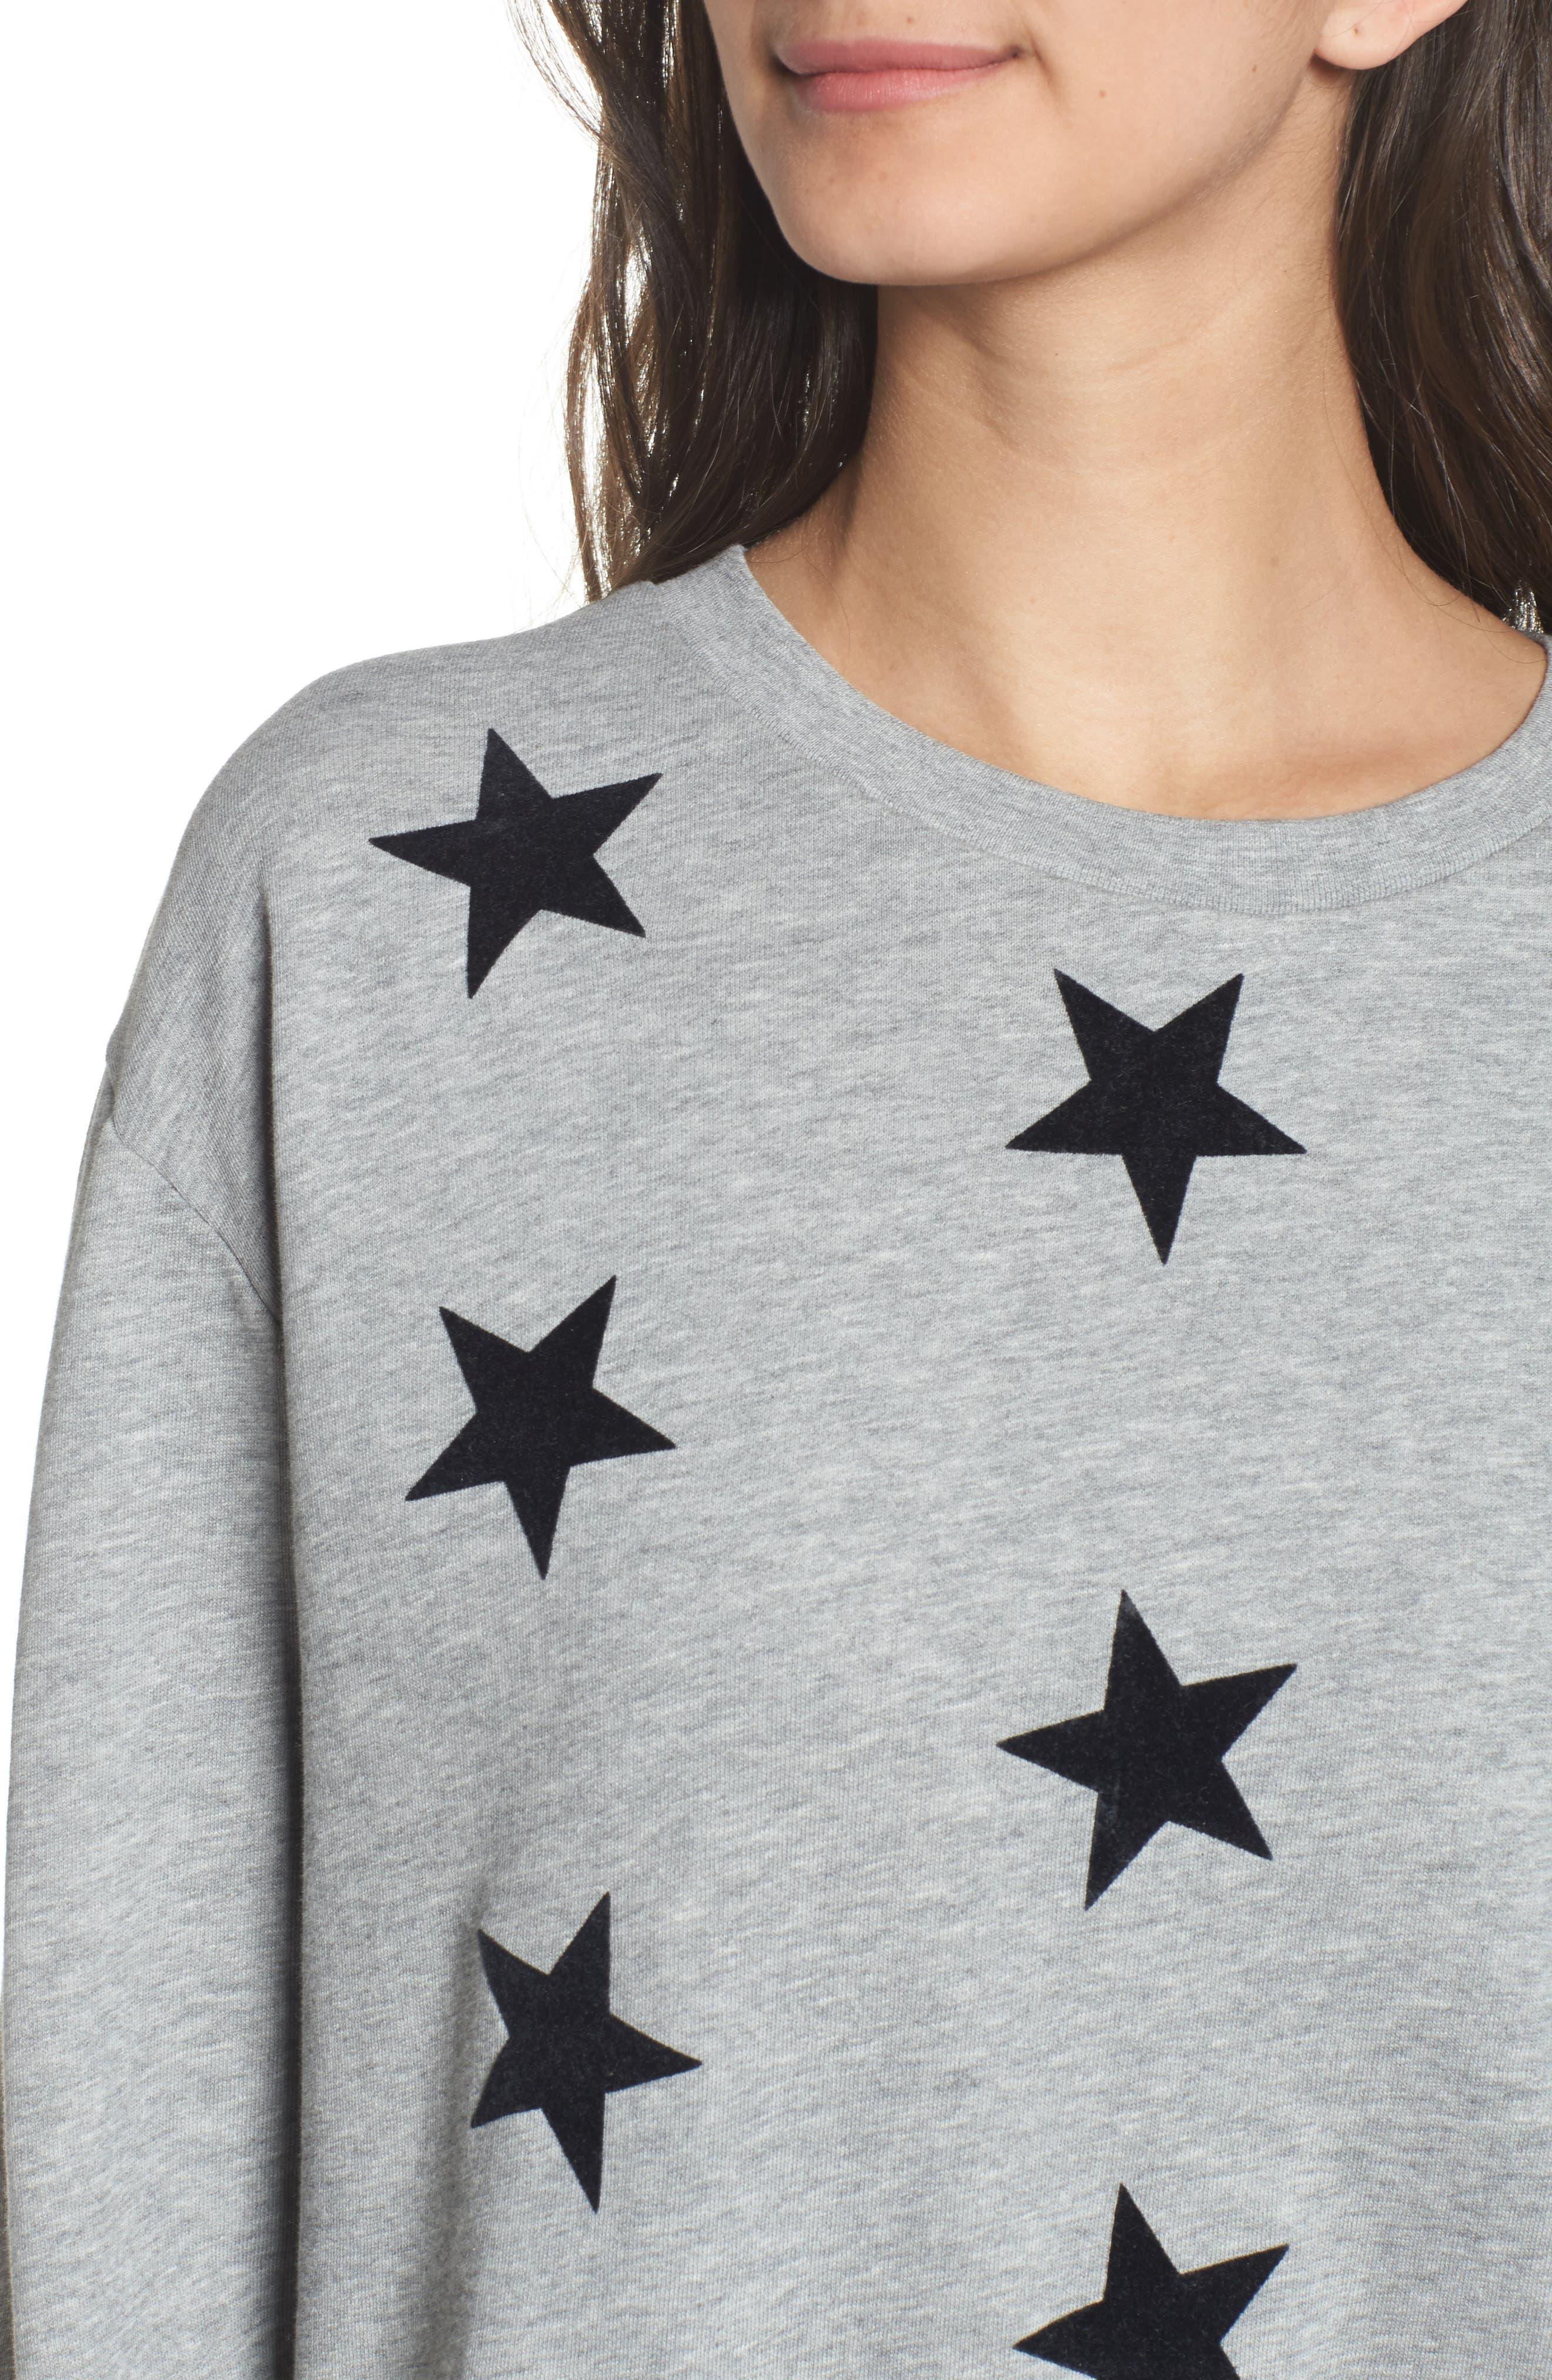 Alexa - Super Stars Sweatshirt,                             Alternate thumbnail 4, color,                             GREY